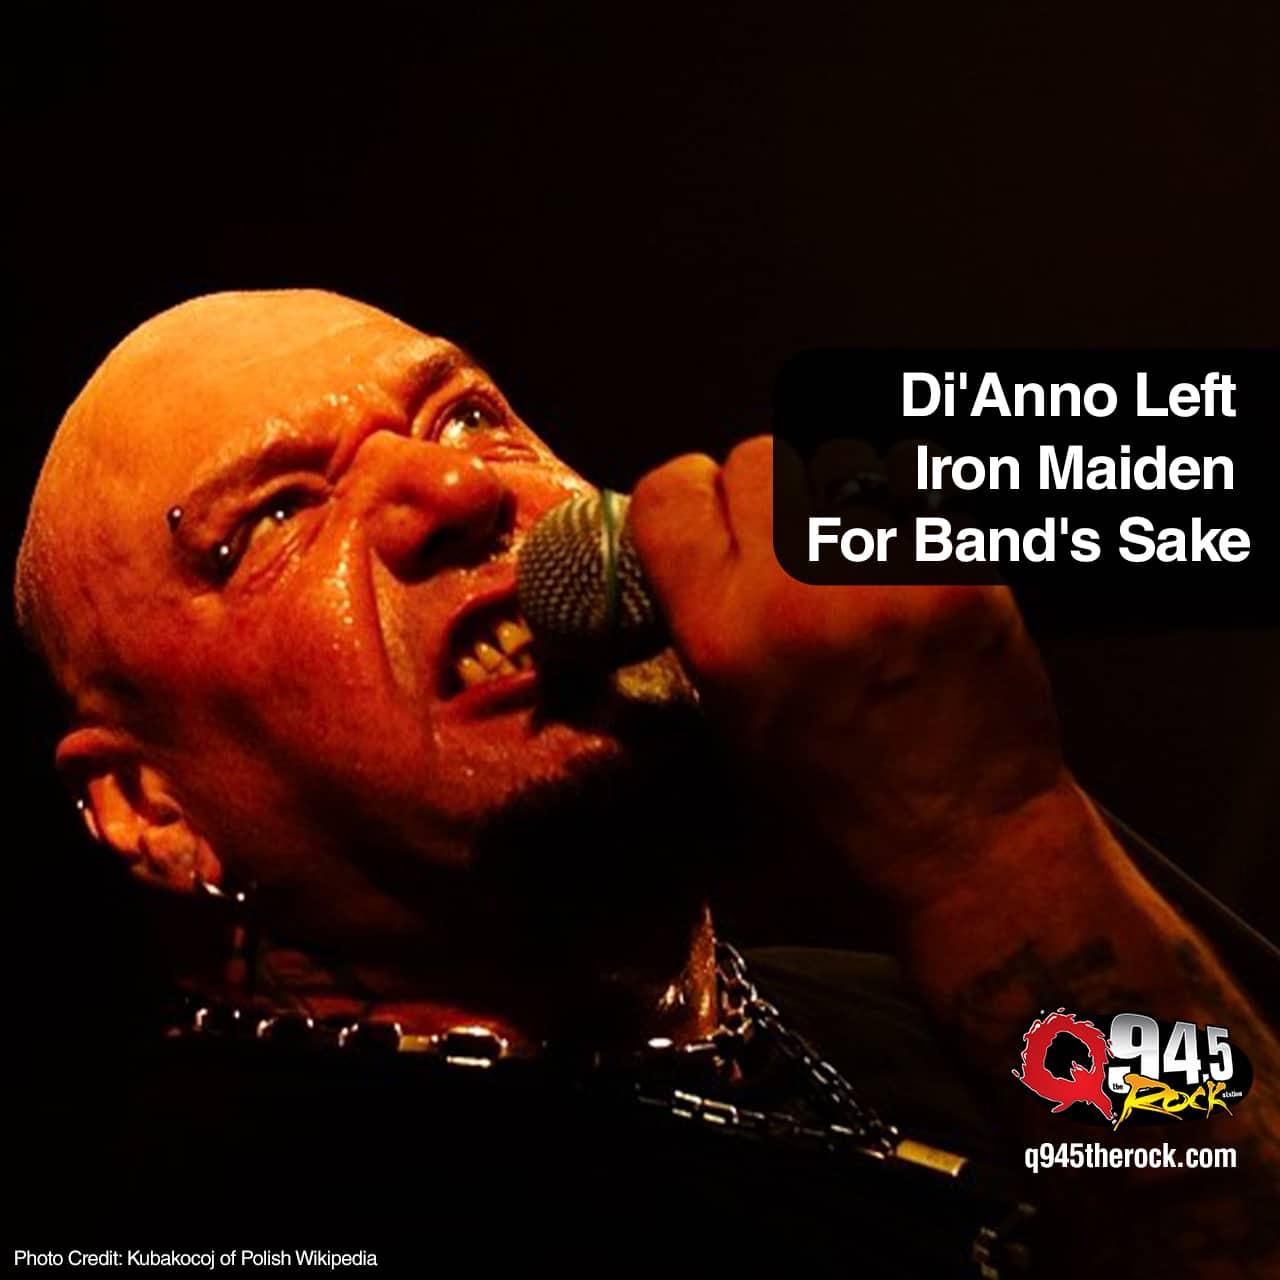 Di'Anno Left Iron Maiden For Band's Sake